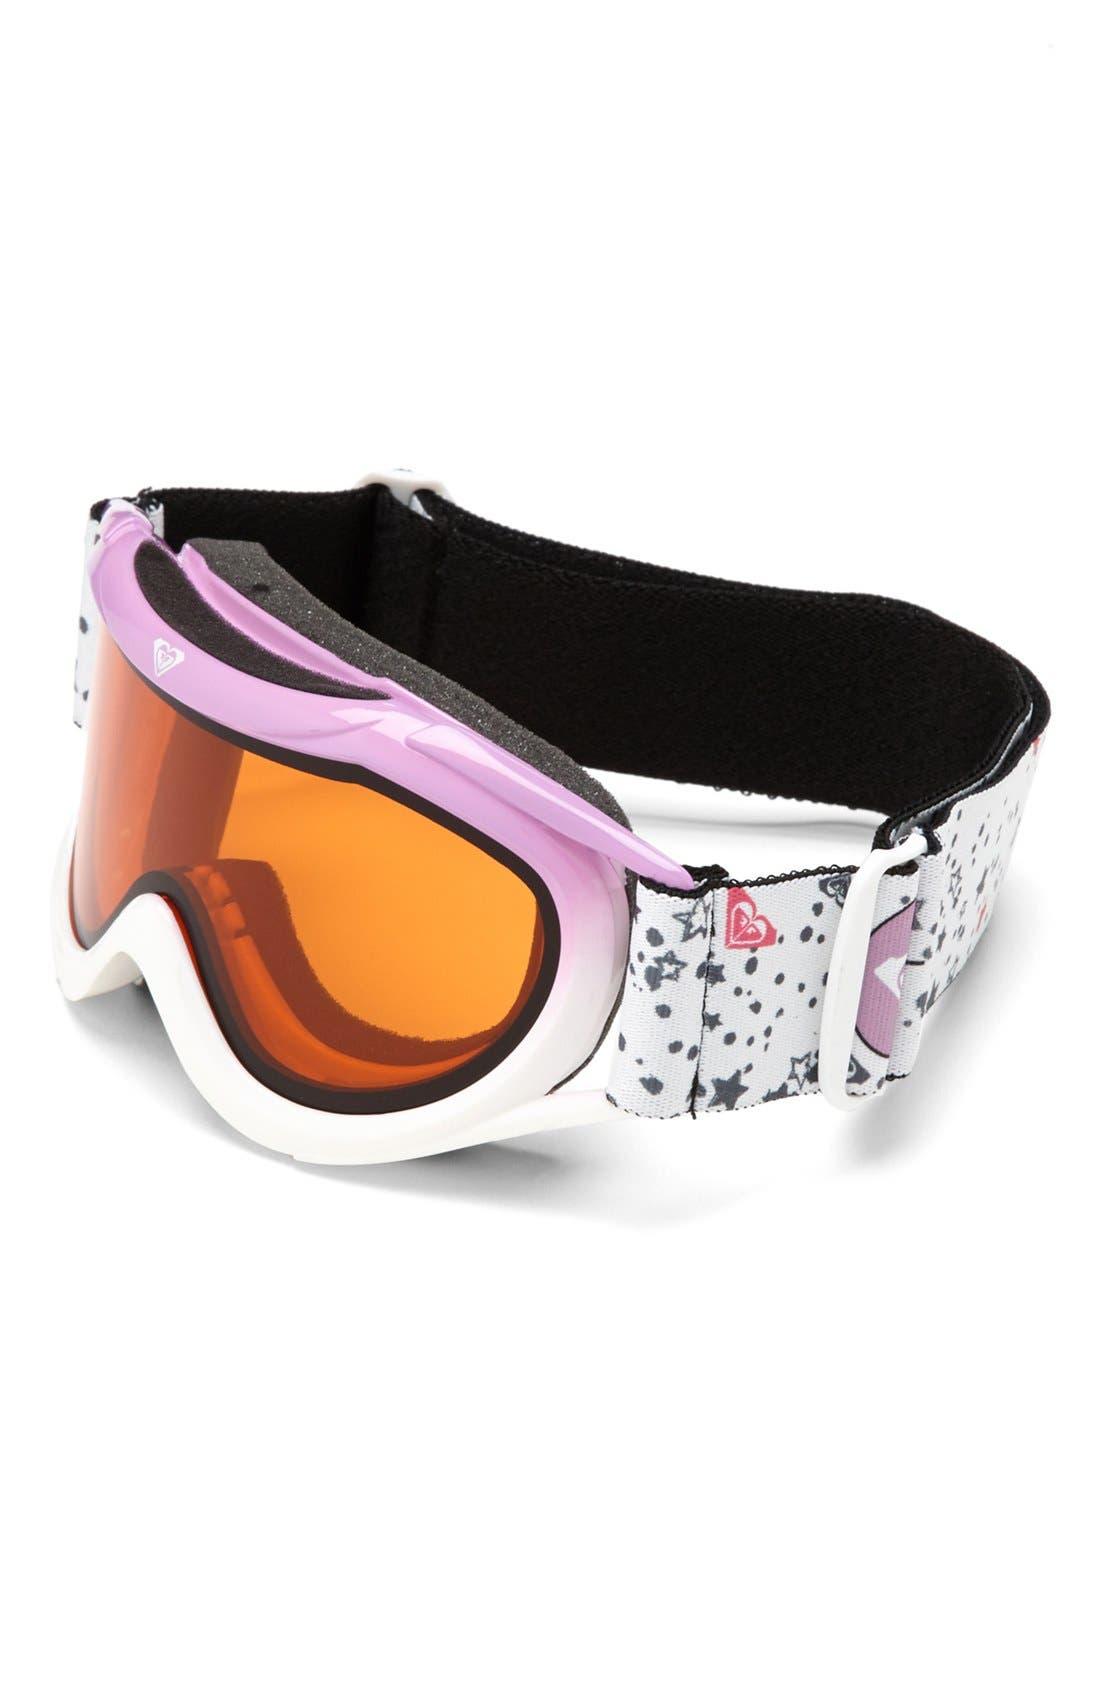 Main Image - Roxy 'Loola' Snow Goggles (Girls)